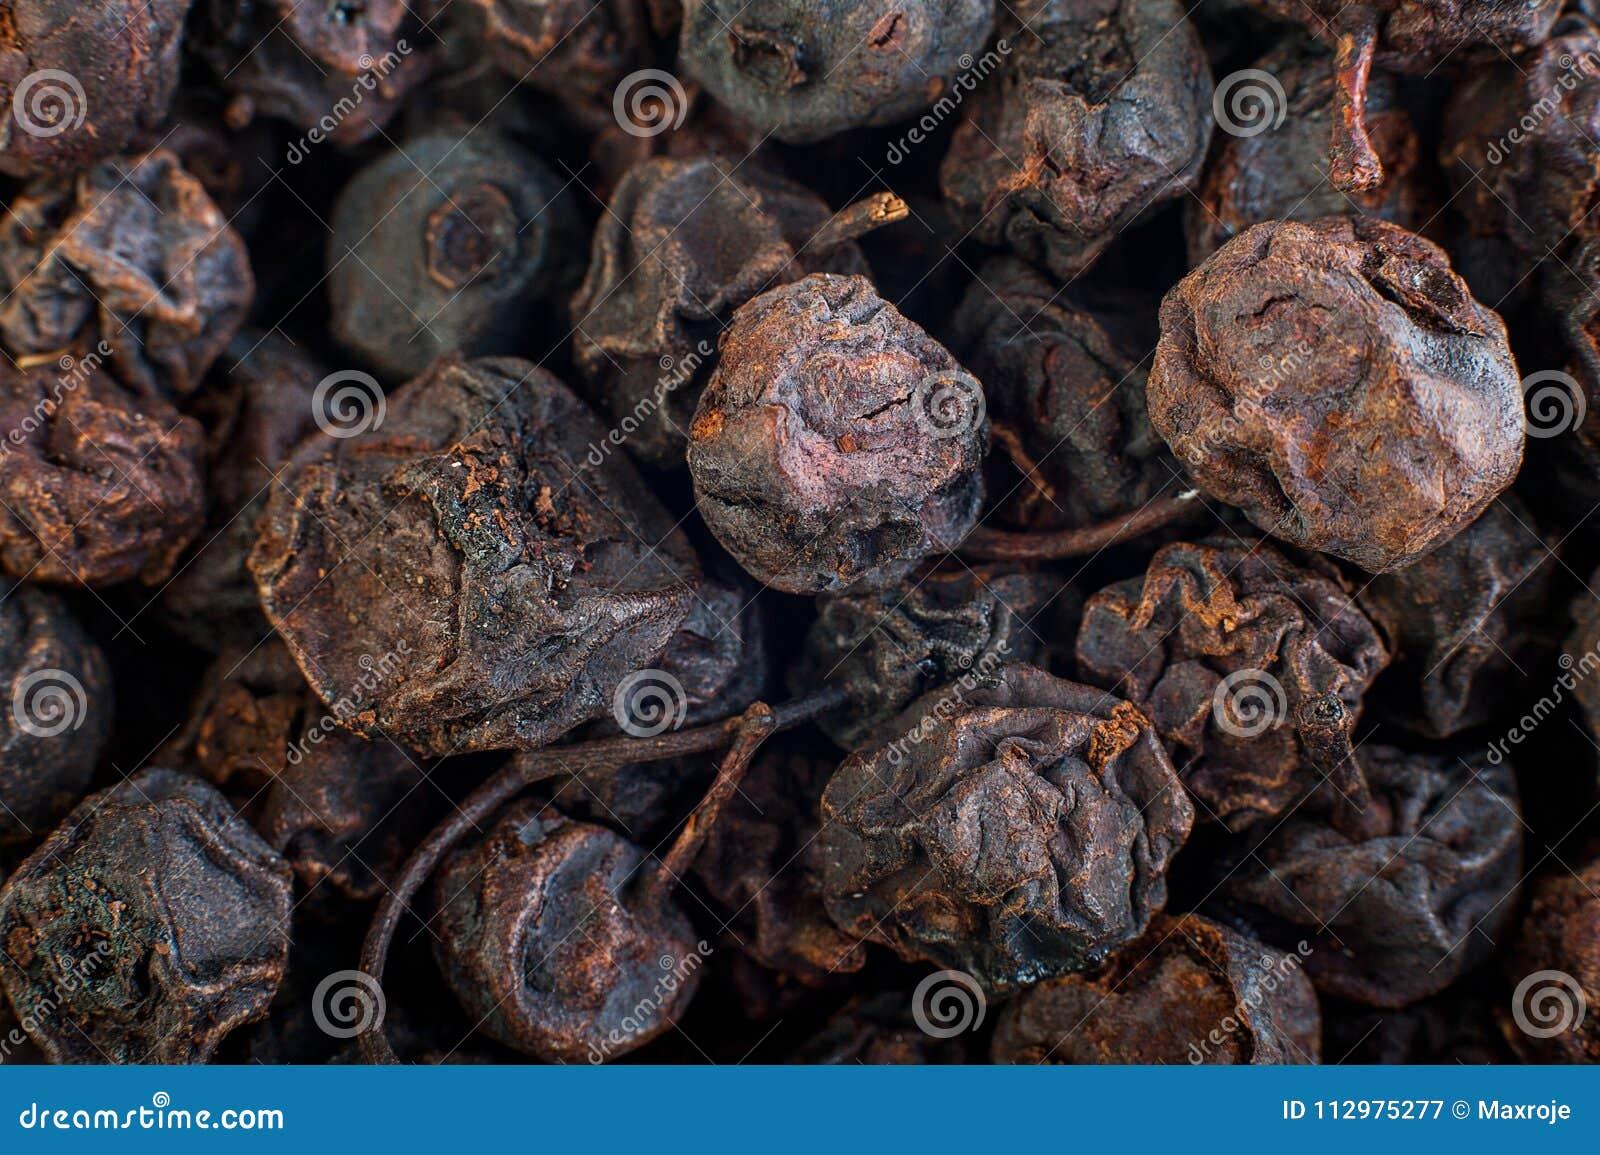 Texture of dried black berries, food background